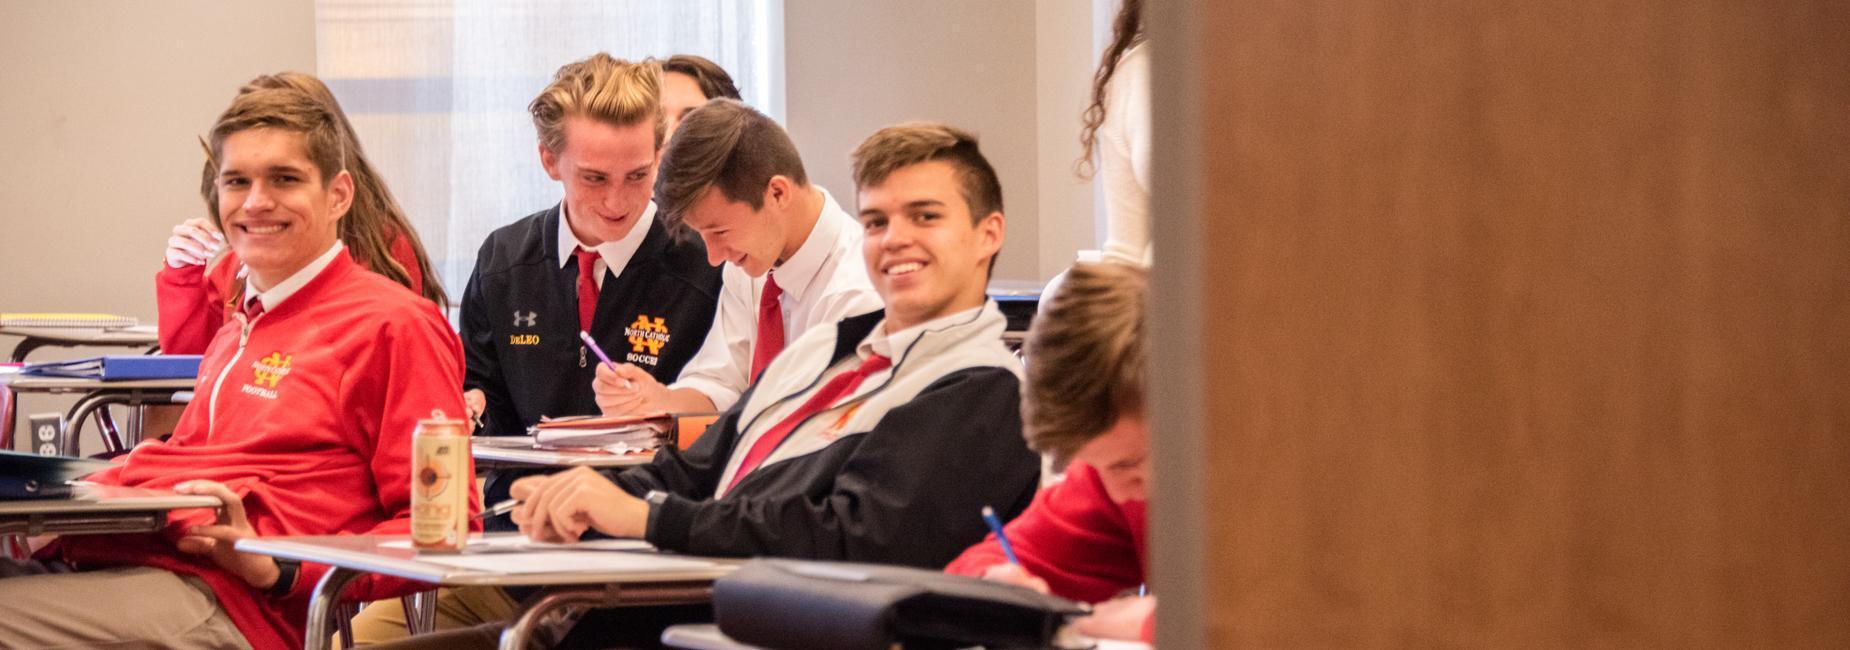 North Catholic Honors Classes